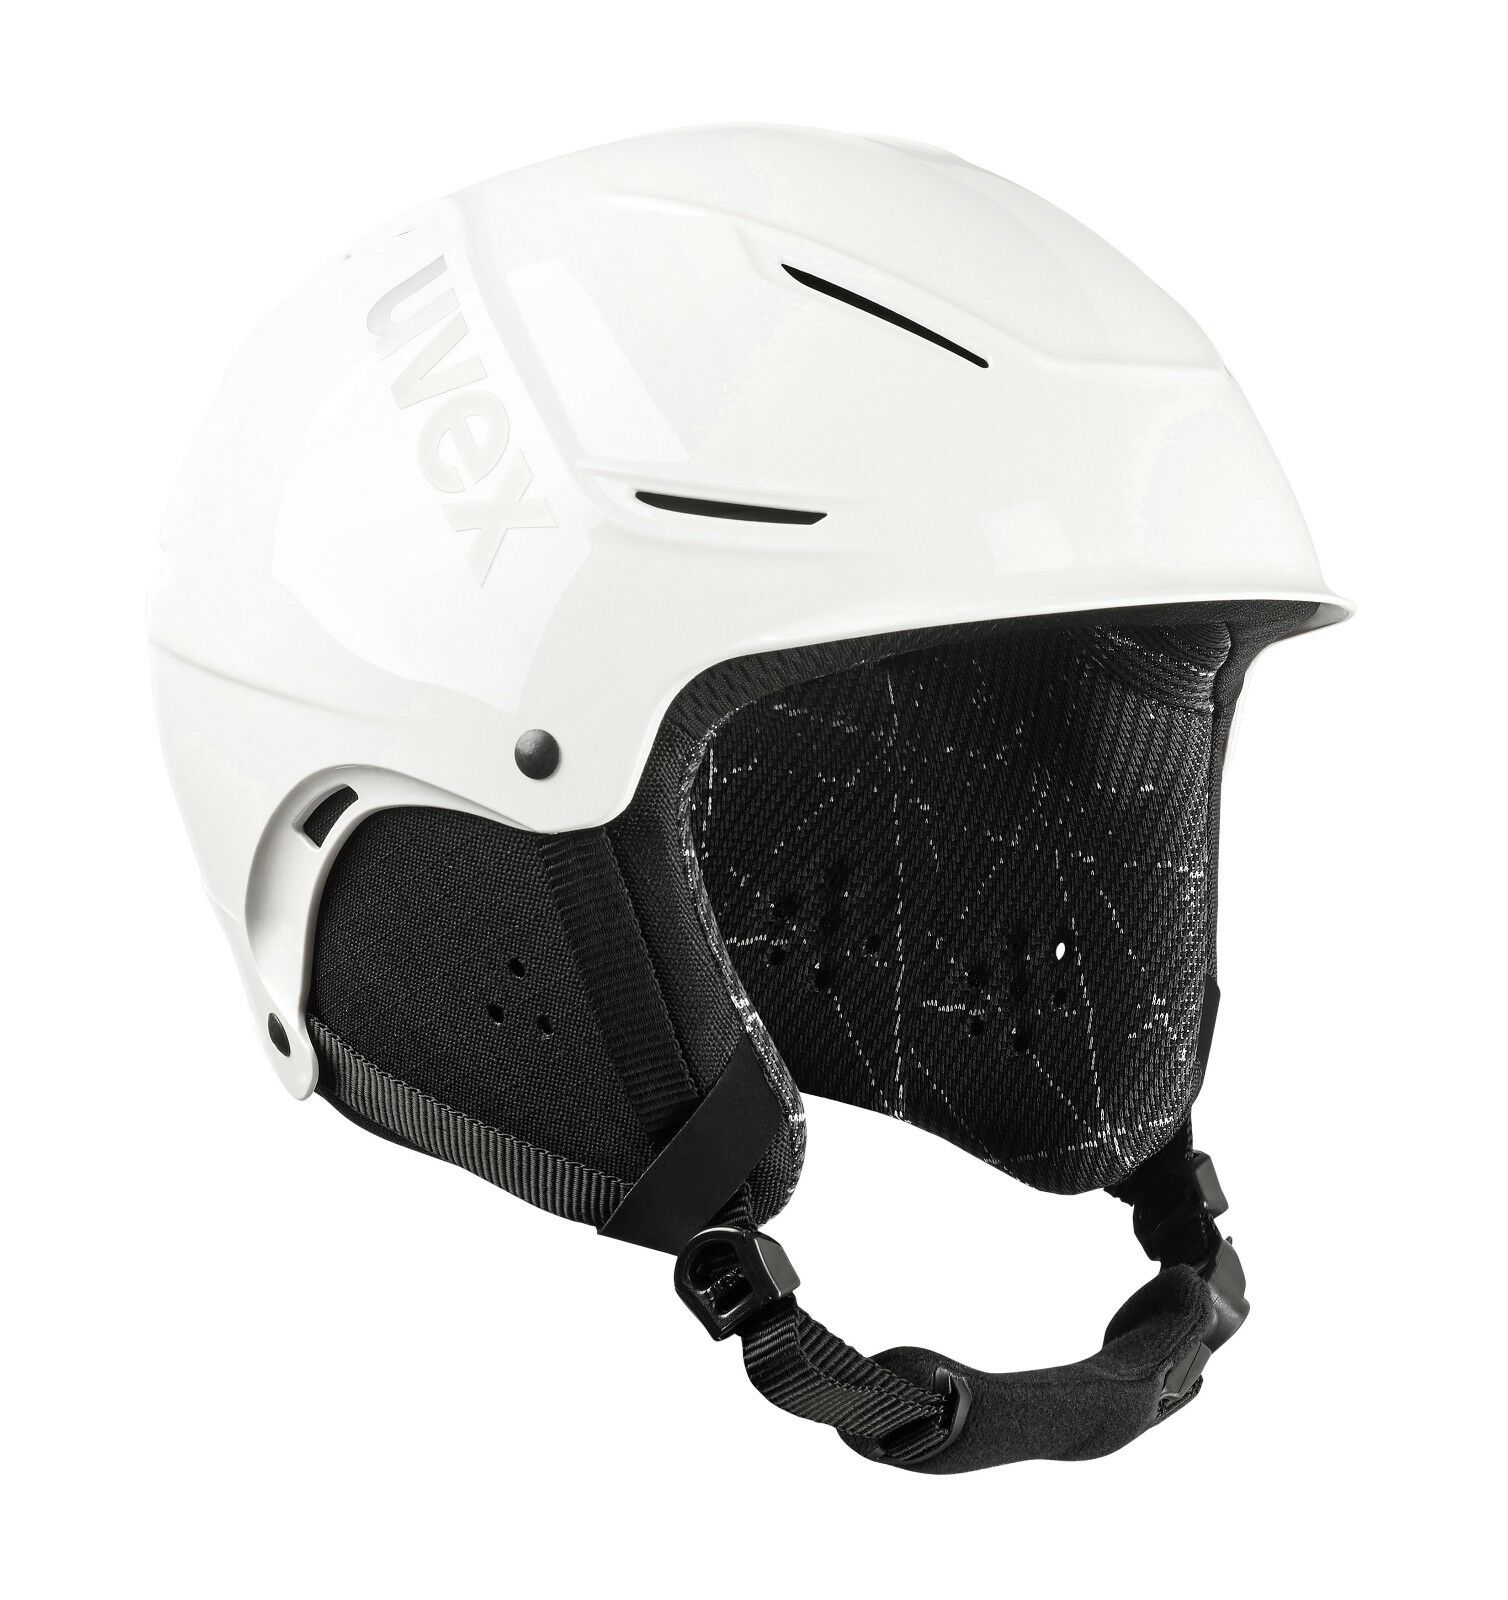 UVEX Ski- & Snowboardhelm - p1us - Hartschalenhelm - aktives Belüftungssystem